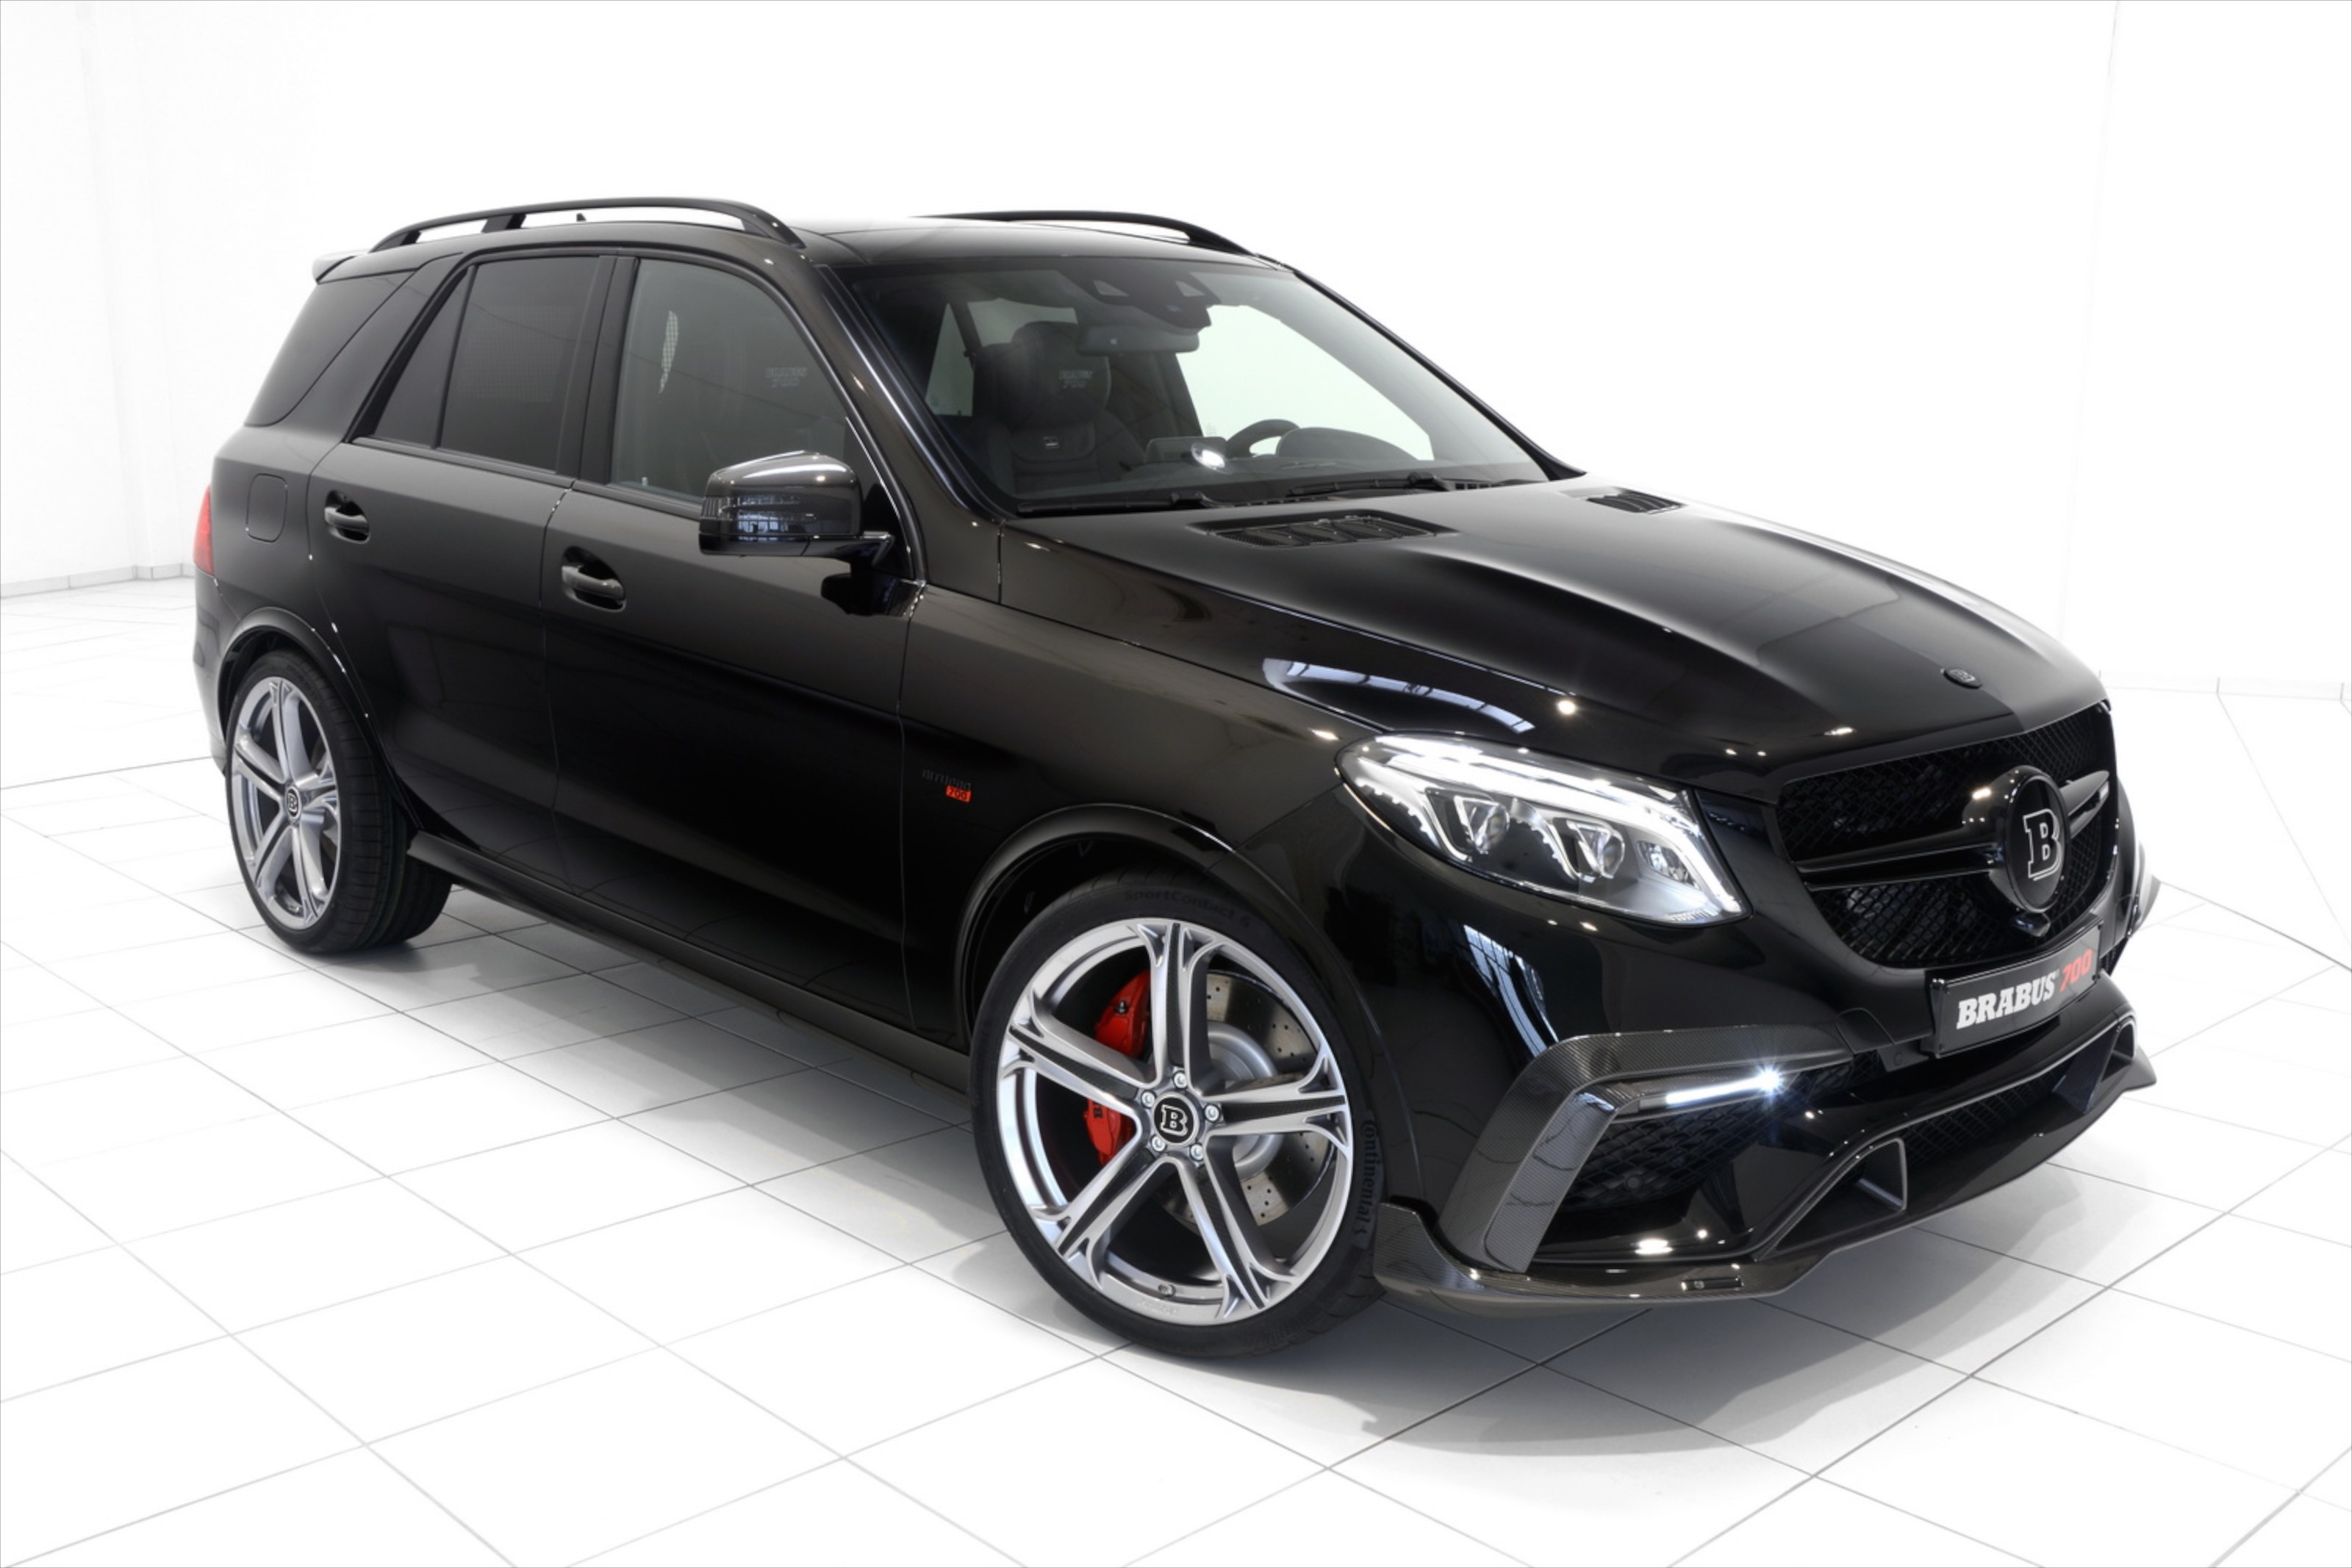 Brabus Gle 700 Mercedes Amg Gle 63 With 700 Ps Image 458282